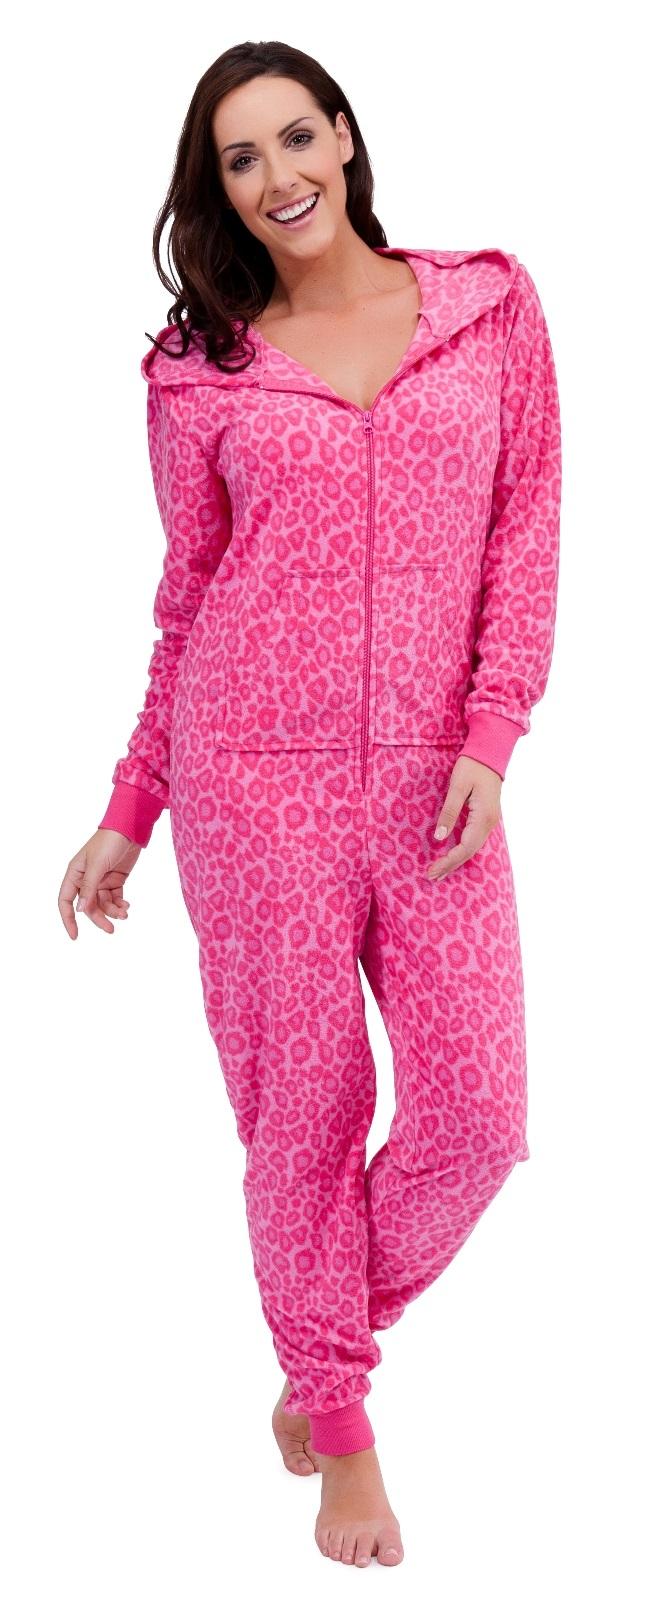 7fb9ed47cb Womens Hooded PJ s All In One Onezee Jumpsuits Pyjamas Ladies Onezie ...